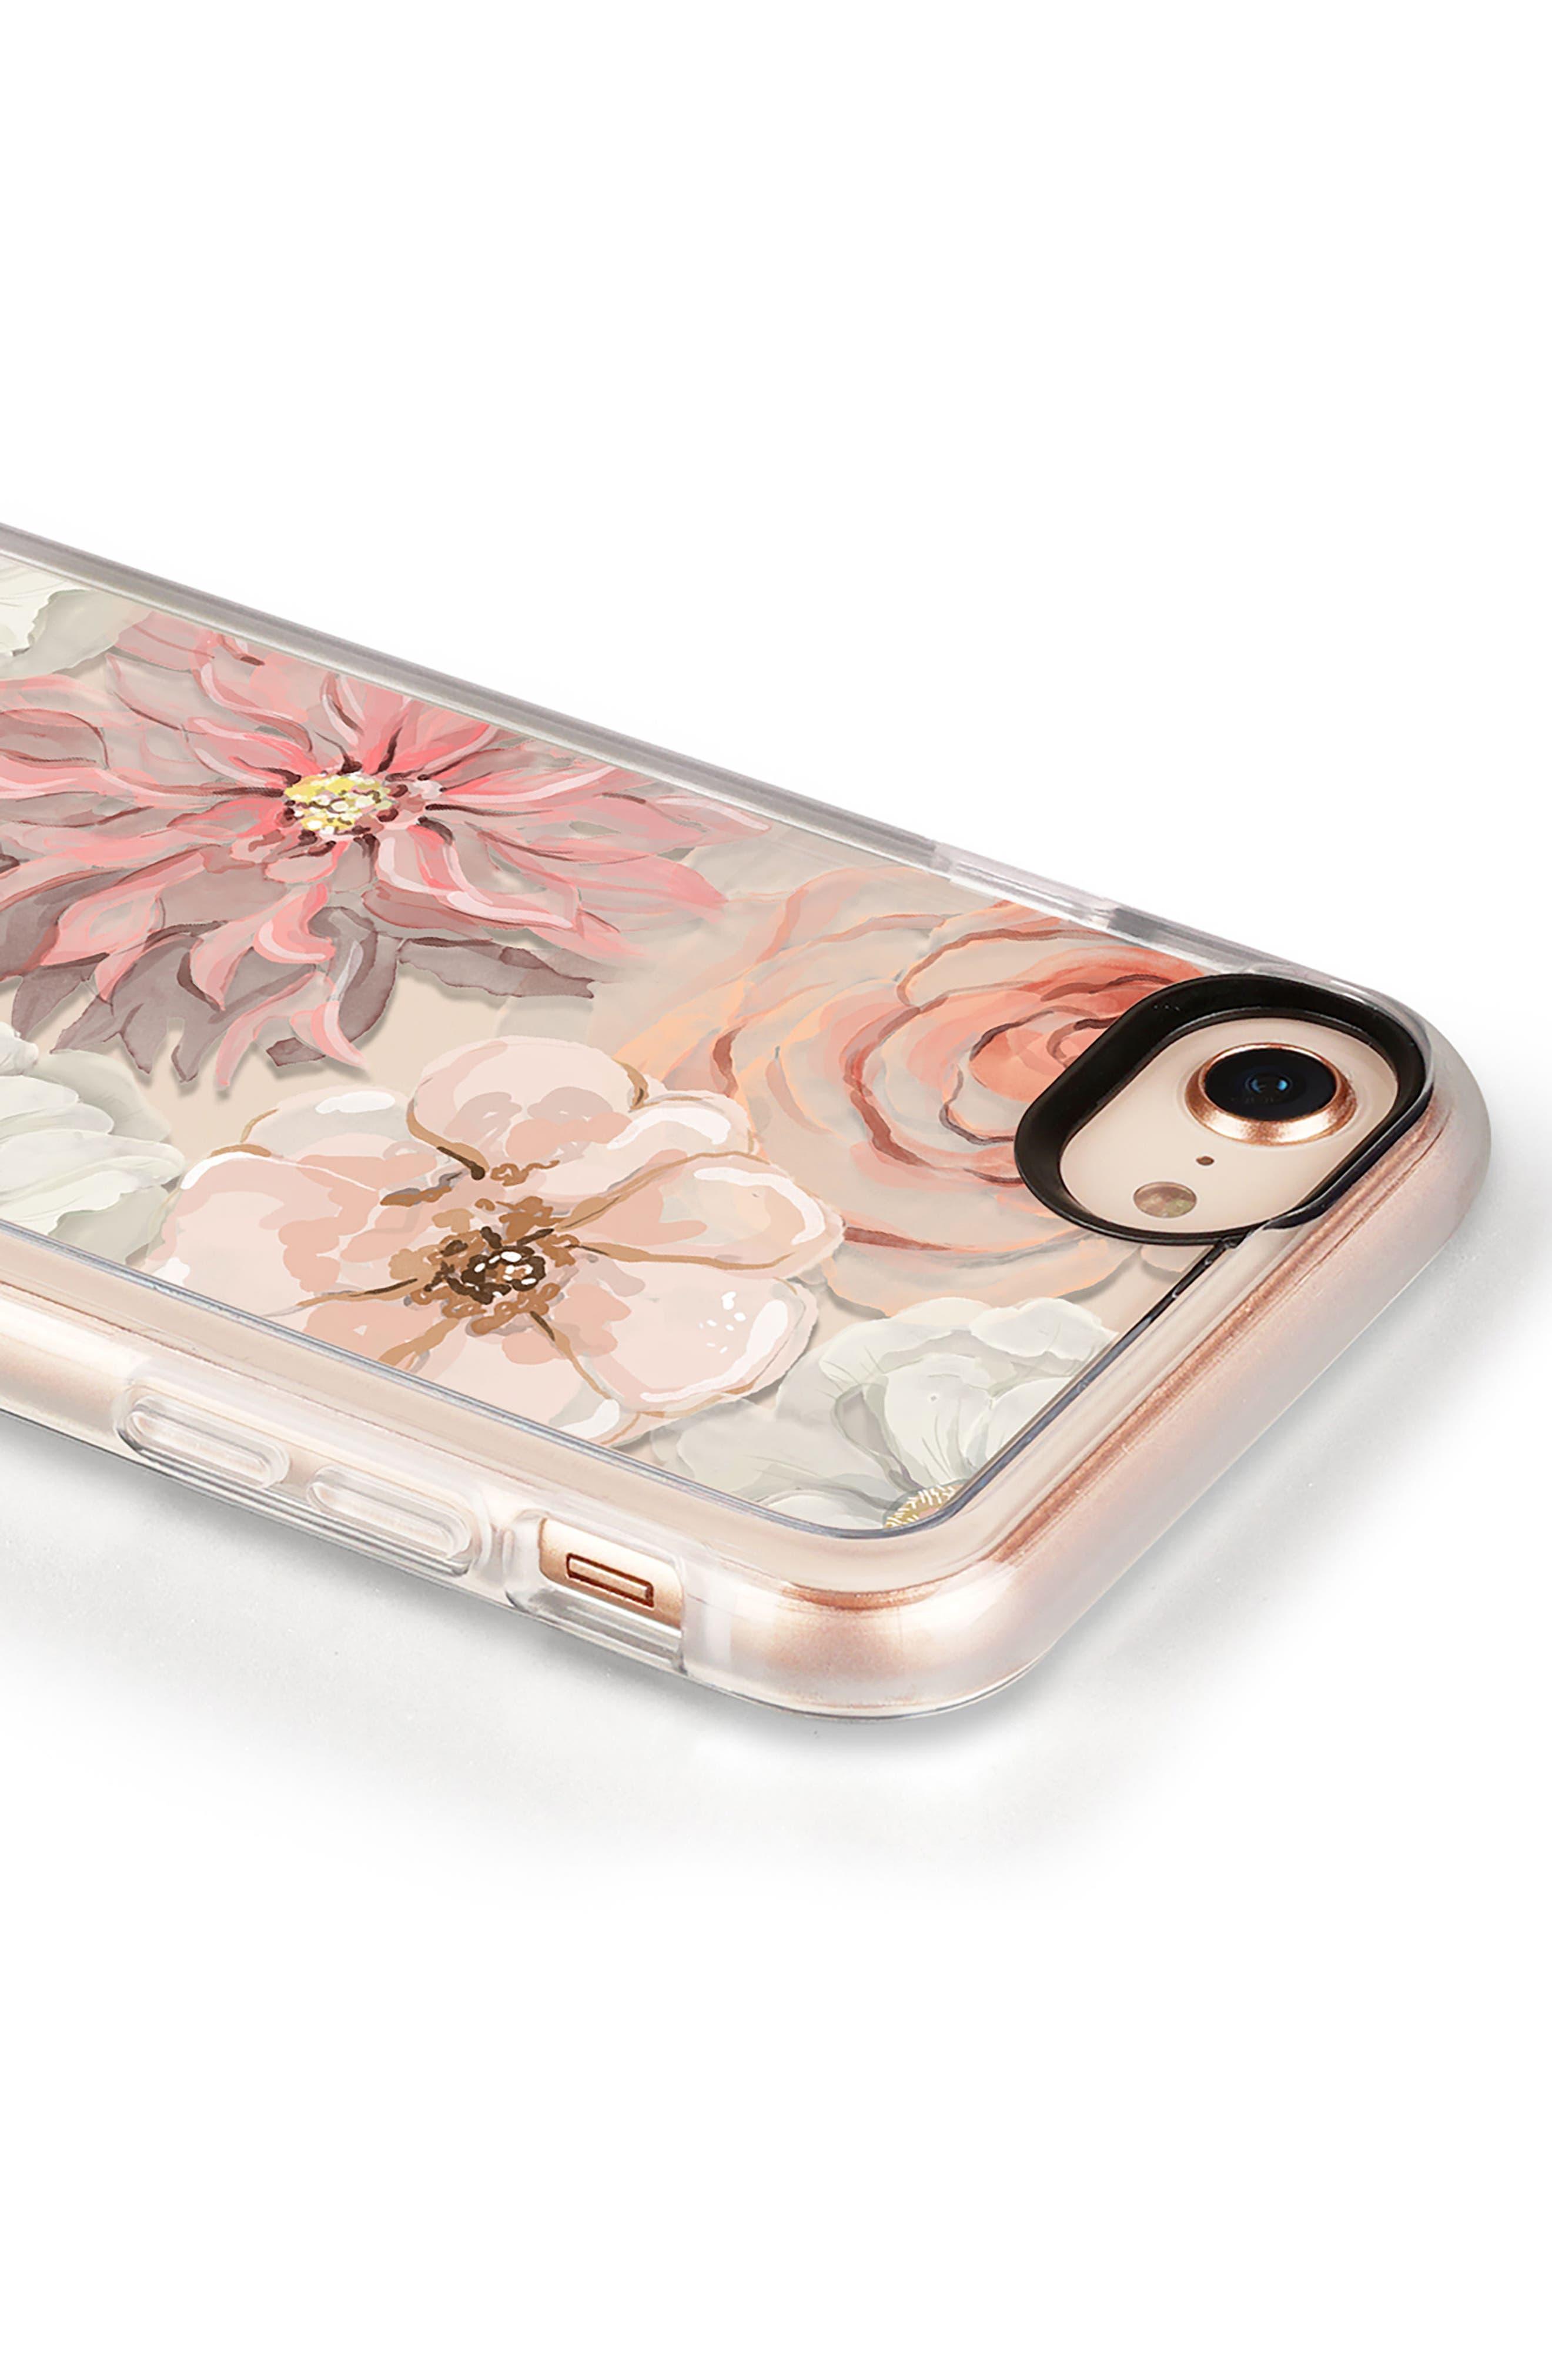 Pretty Blush iPhone 7/8 & 7/8 Plus Case,                             Alternate thumbnail 6, color,                             Blush Pink